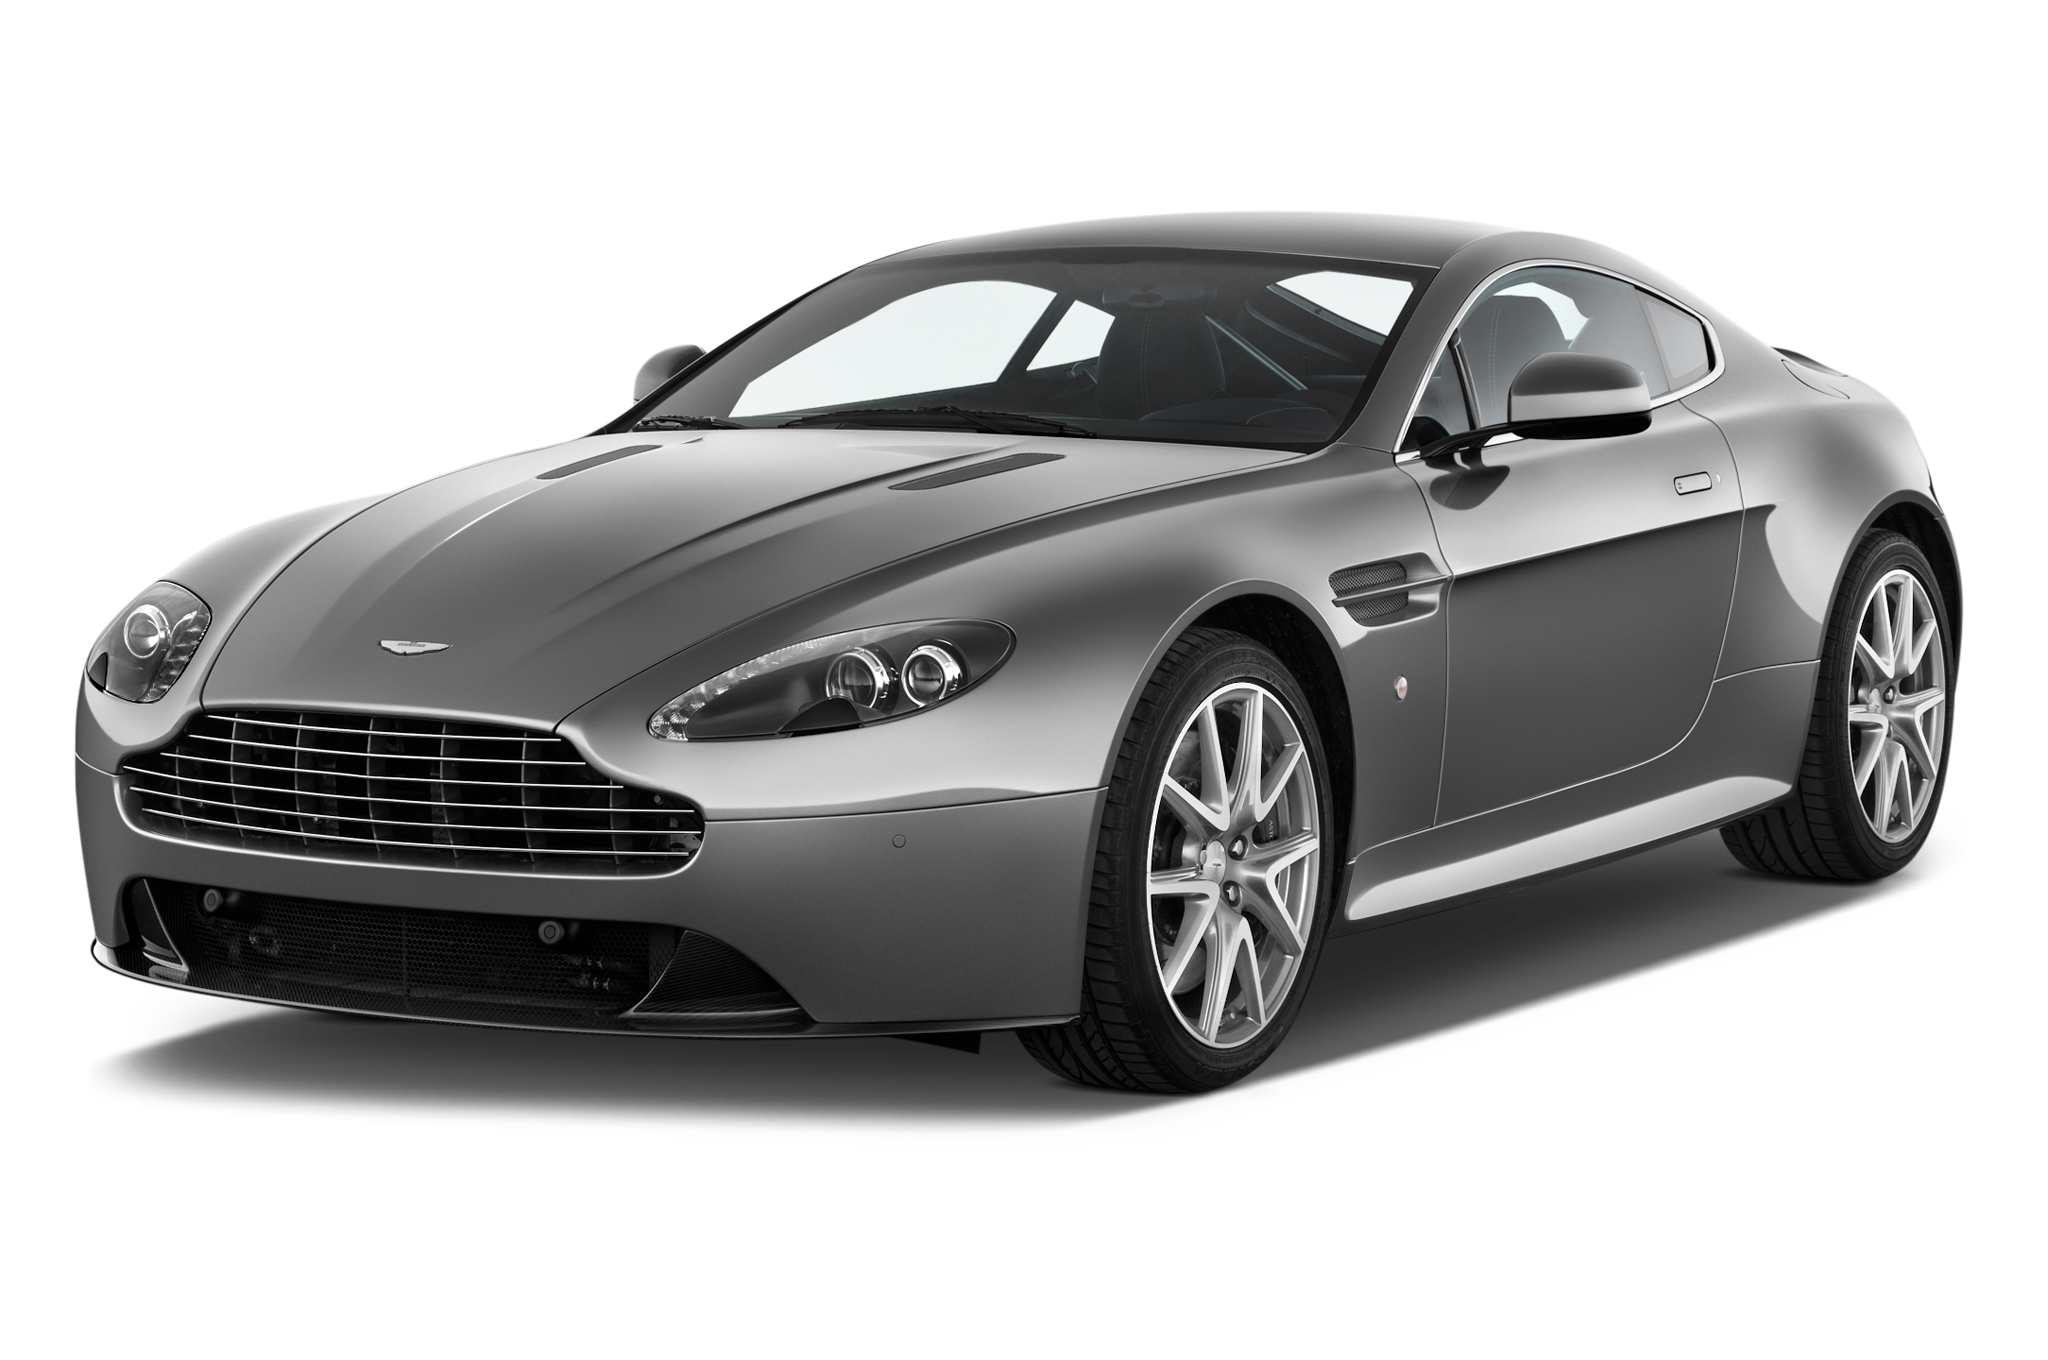 Aston Martin VANQUISH 2016 International Price & Overview